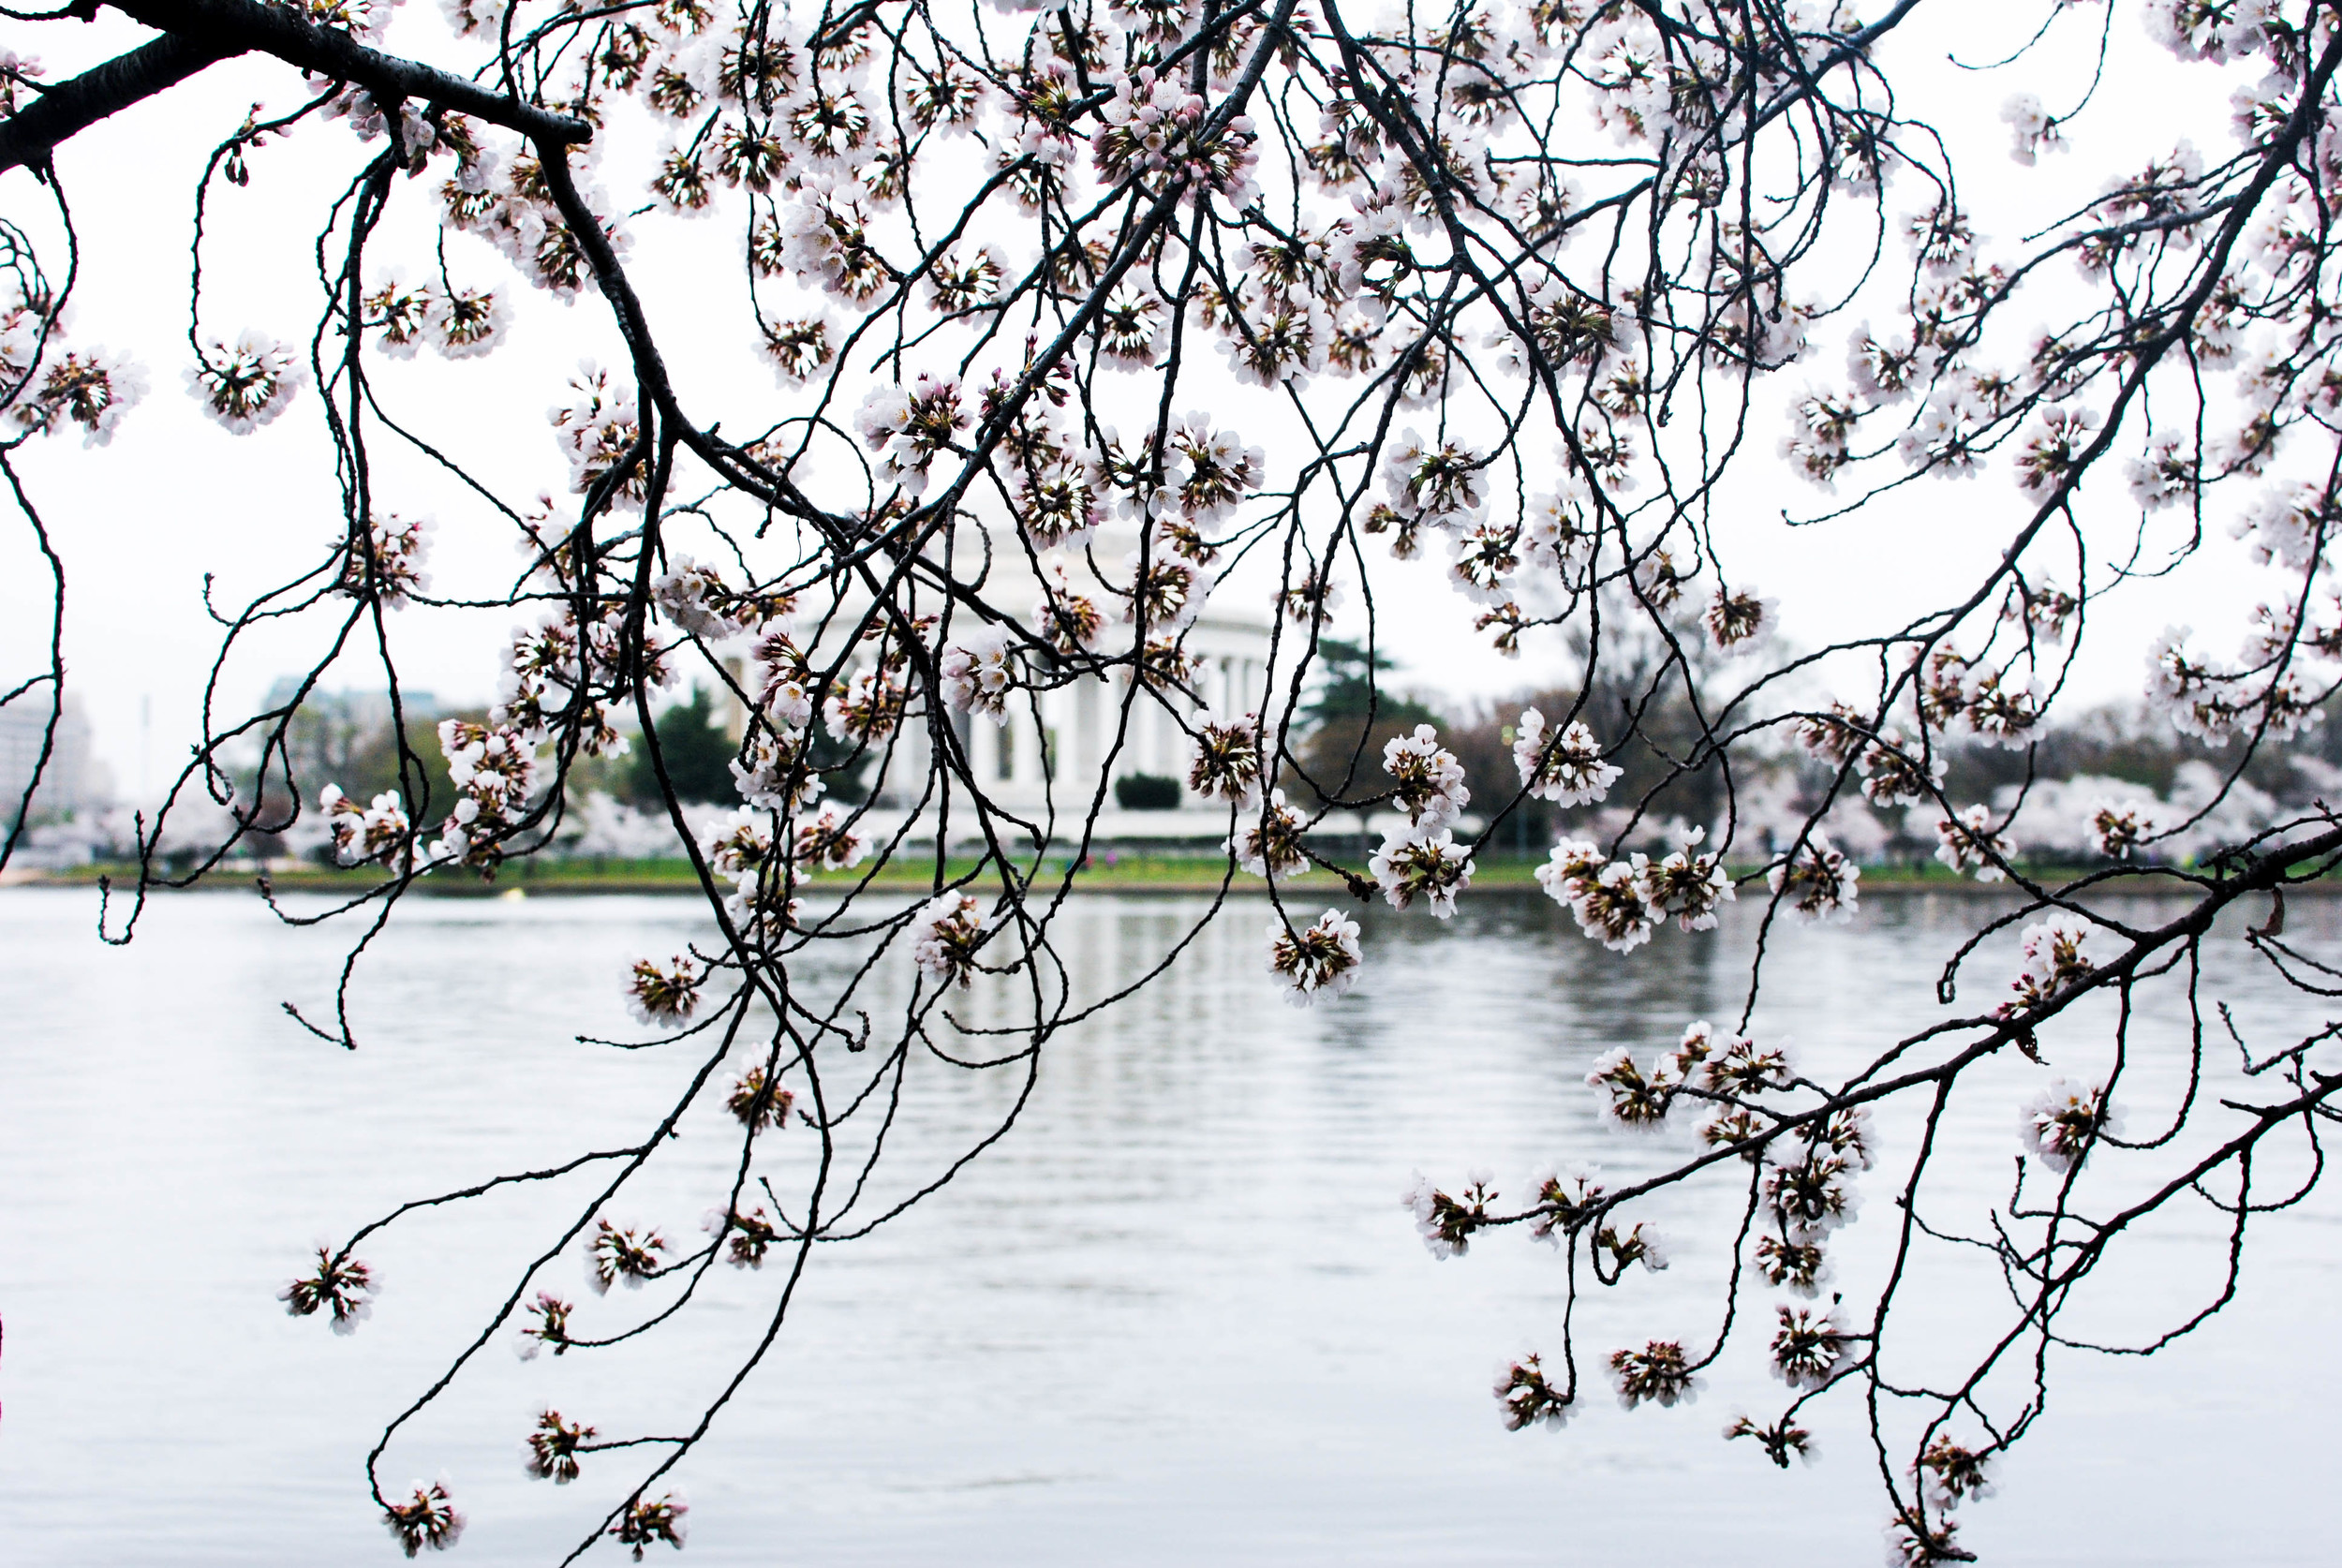 cherry blossoms @ the jefferson memorial.